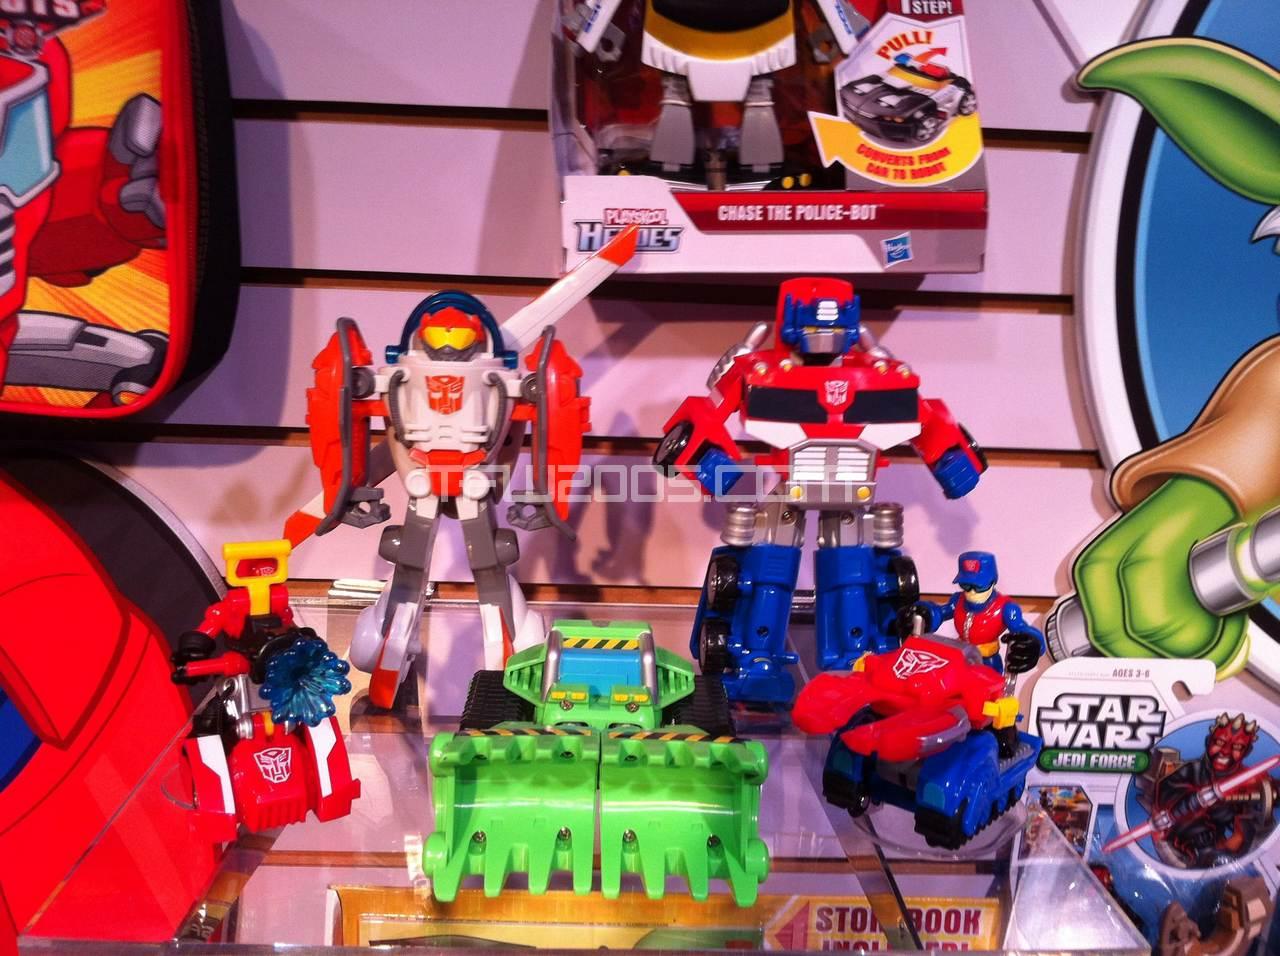 Transformers Rescue Bots Energize Toys